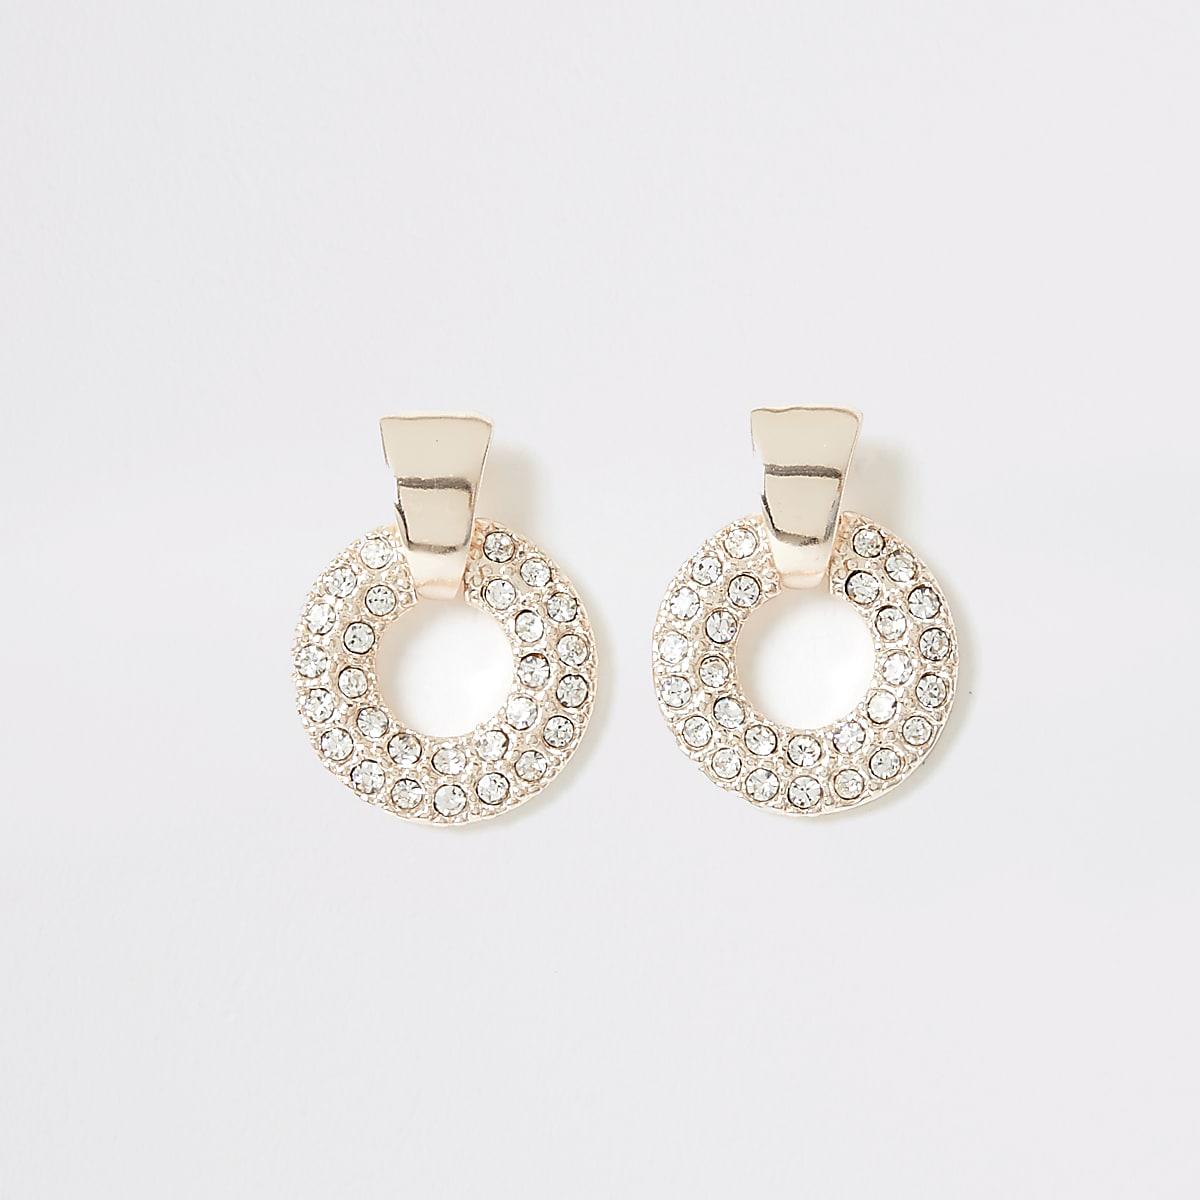 Rose gold diamante ring drop stud earrings